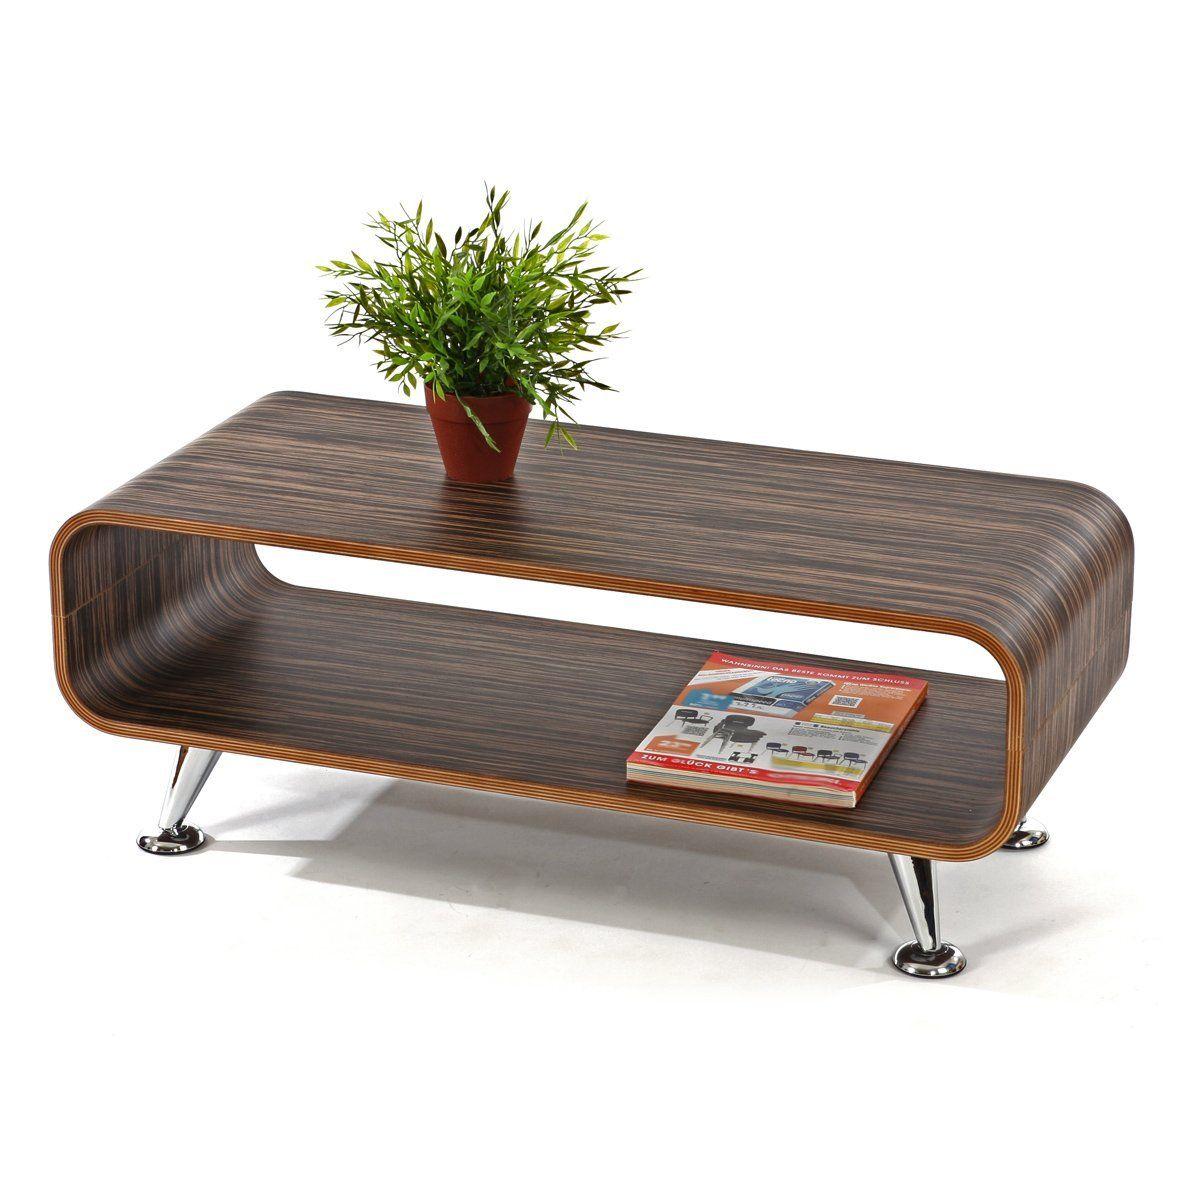 Club TV Rack Fernsehregal Retro Lounge Tisch Mbel Rega Holz Dunklel Gestreift Amazonde